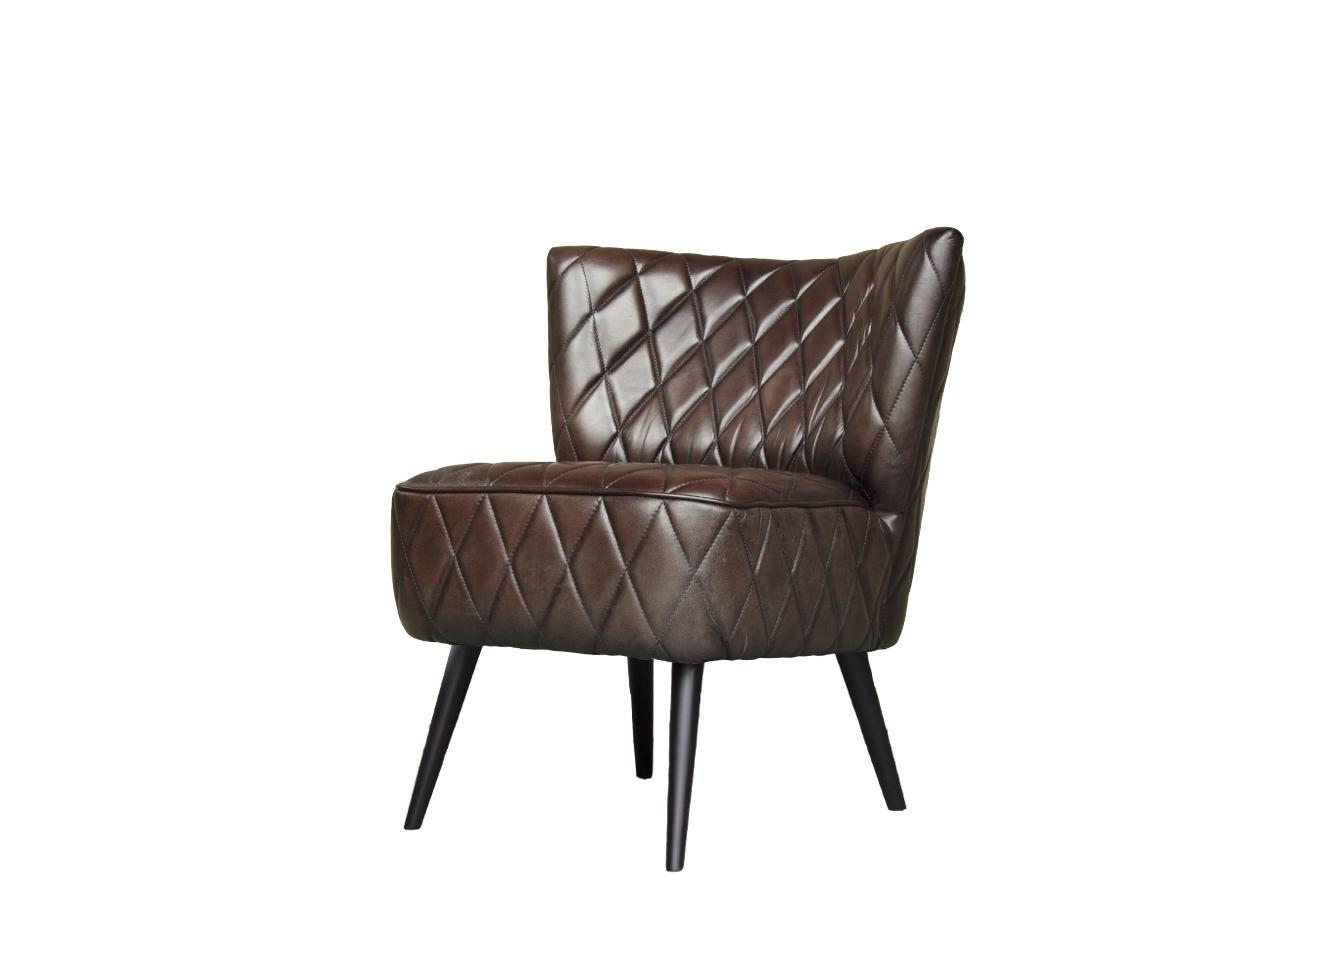 Стул Майк ЛоуОбеденные стулья<br><br><br>Material: Кожа<br>Width см: 60<br>Depth см: 72<br>Height см: 66